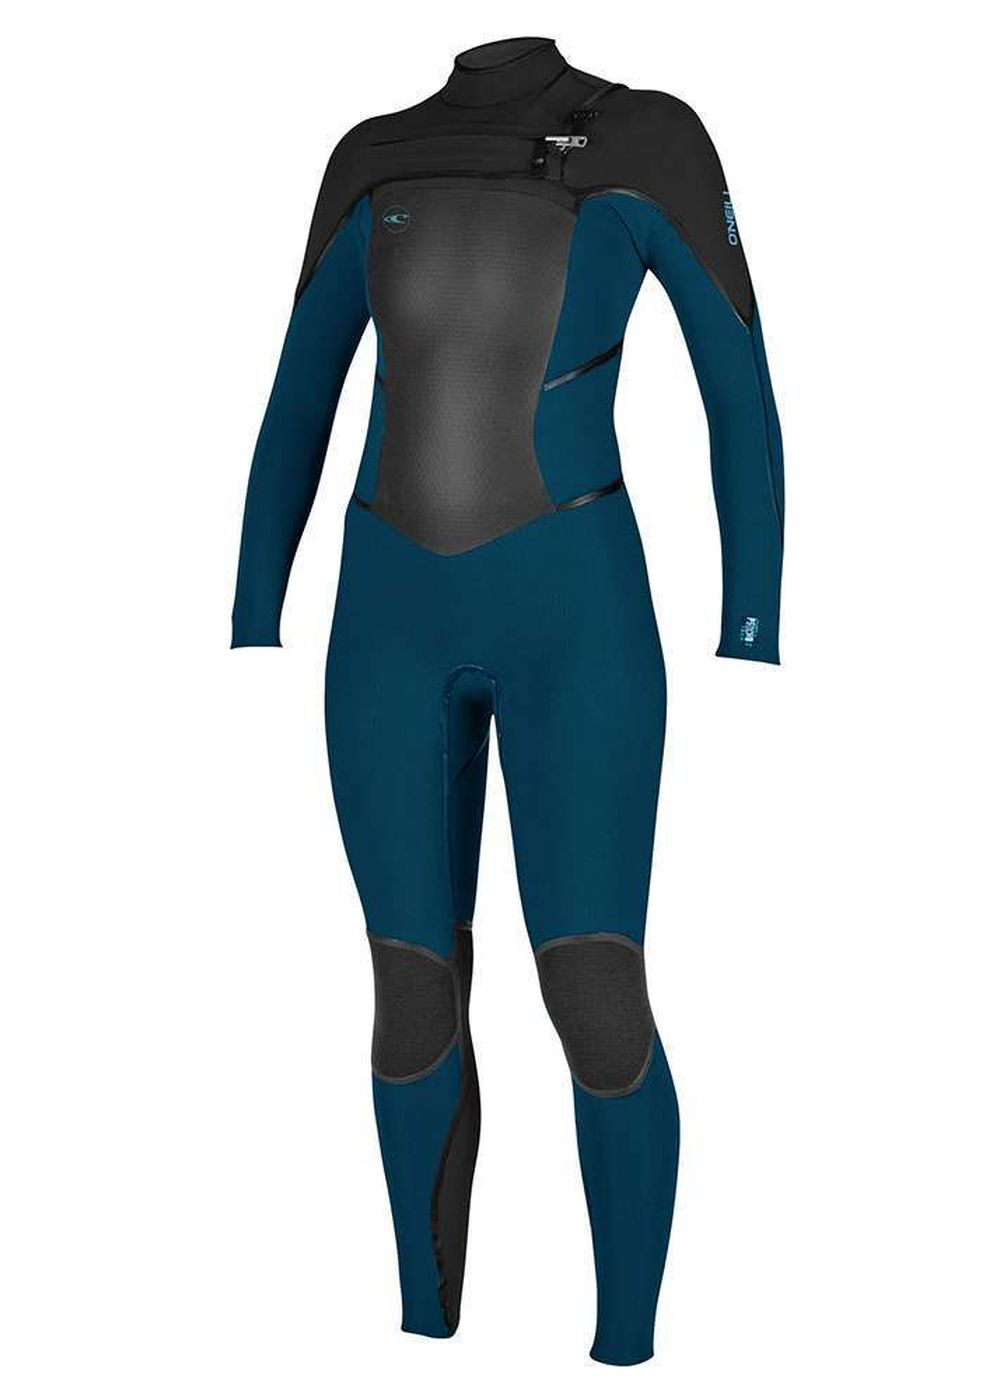 Oneill Womens Psycho Tech Fz 5/4 Wetsuit 18 Sl/blk Picture